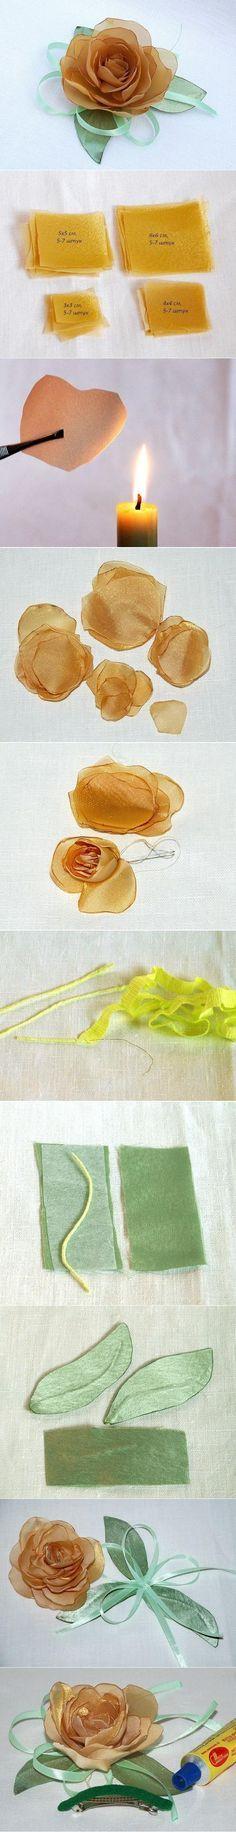 DIY Pretty Hairpin Rose                                                                                                                                                      More